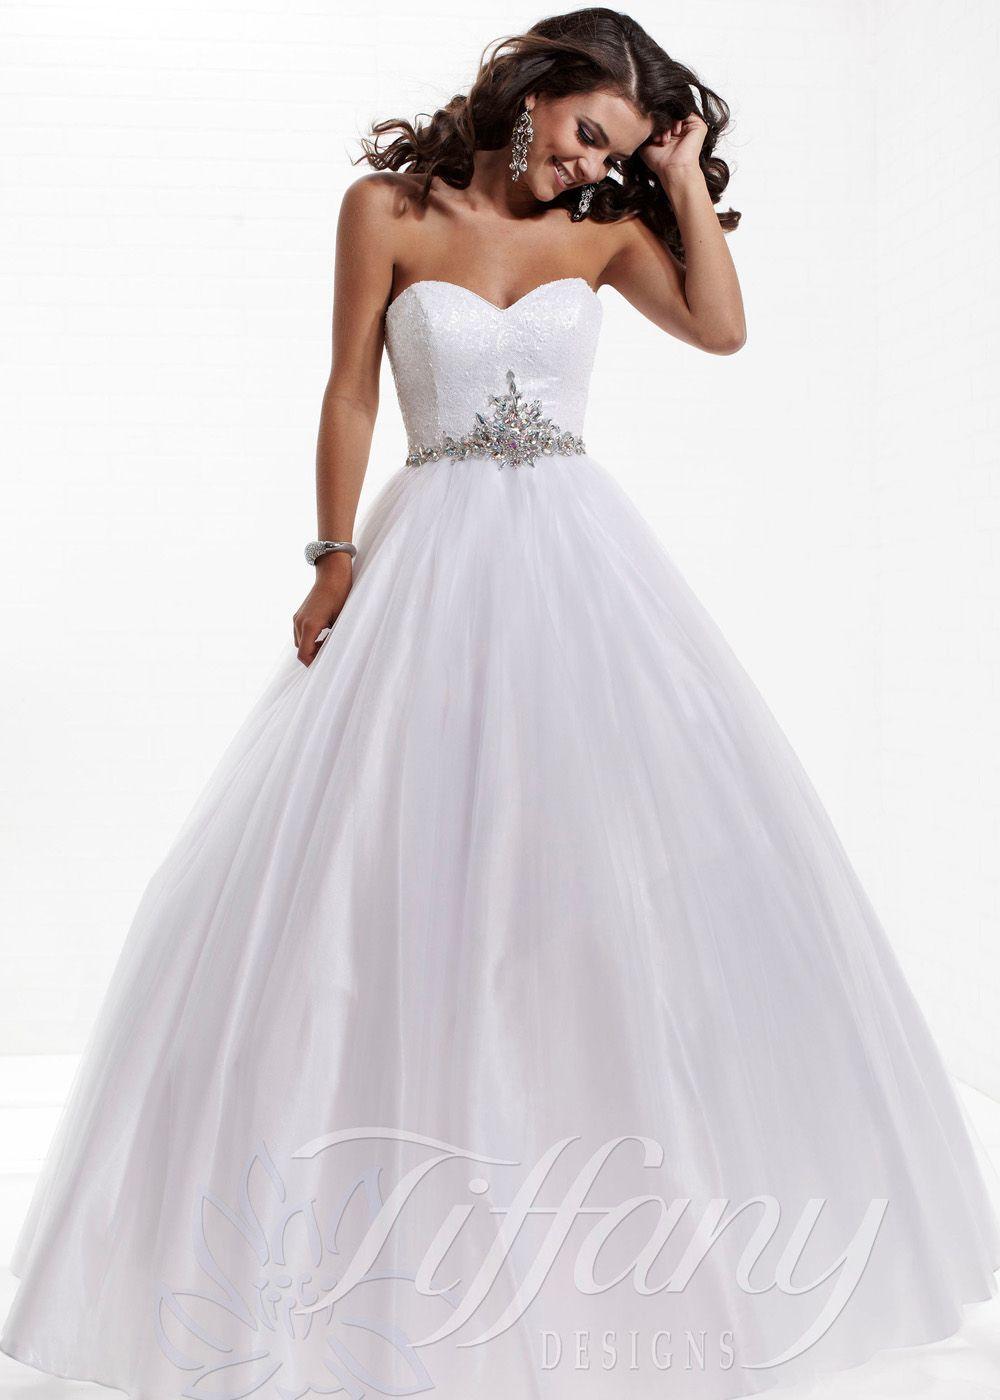 Tiffany designs white ball gown wedding dresses